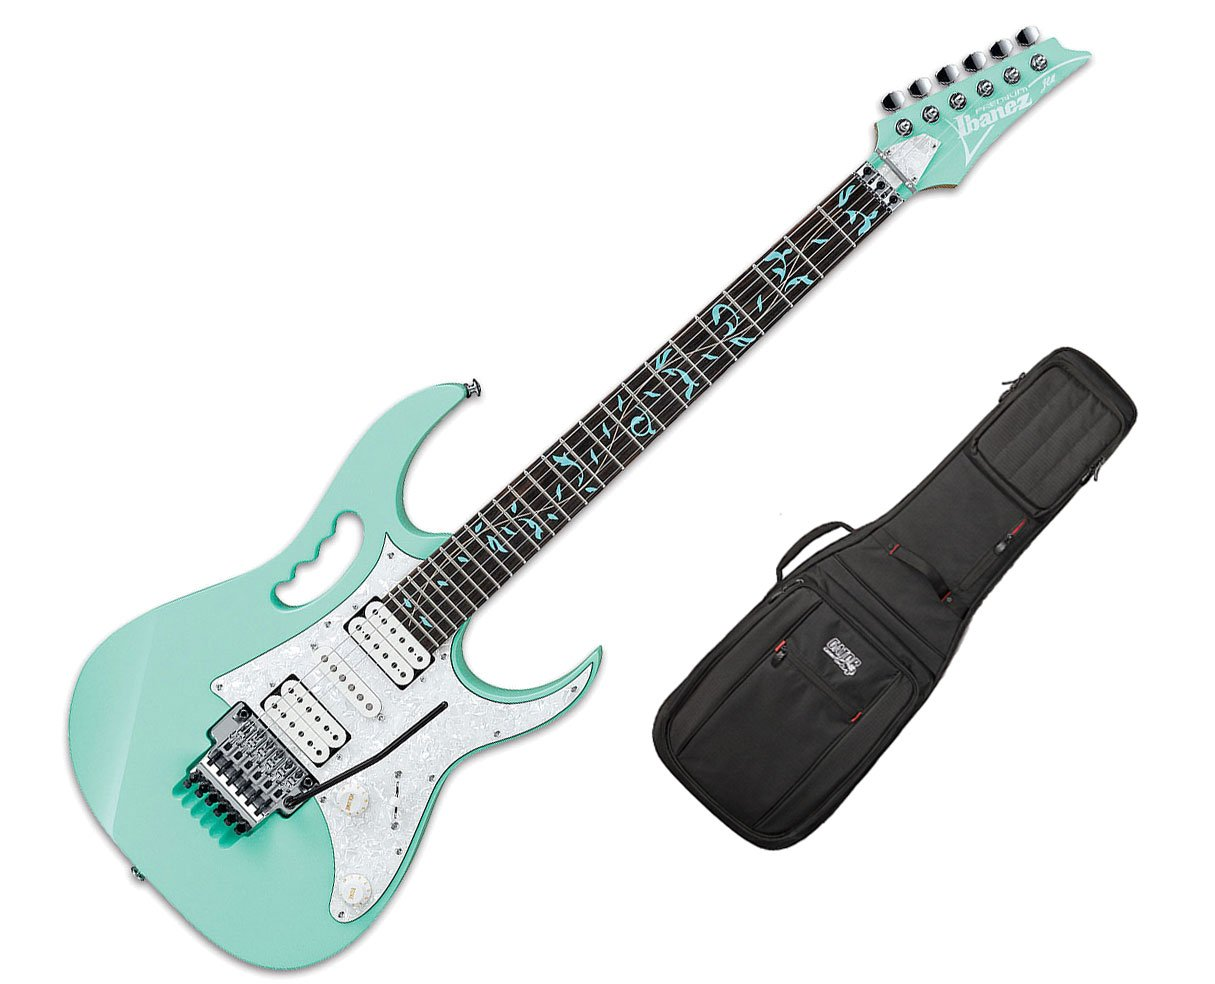 Ibanez jem70 V Steve Vai - Espuma Del Mar Verde w/Pro Serie Gig Bag: Amazon.es: Instrumentos musicales